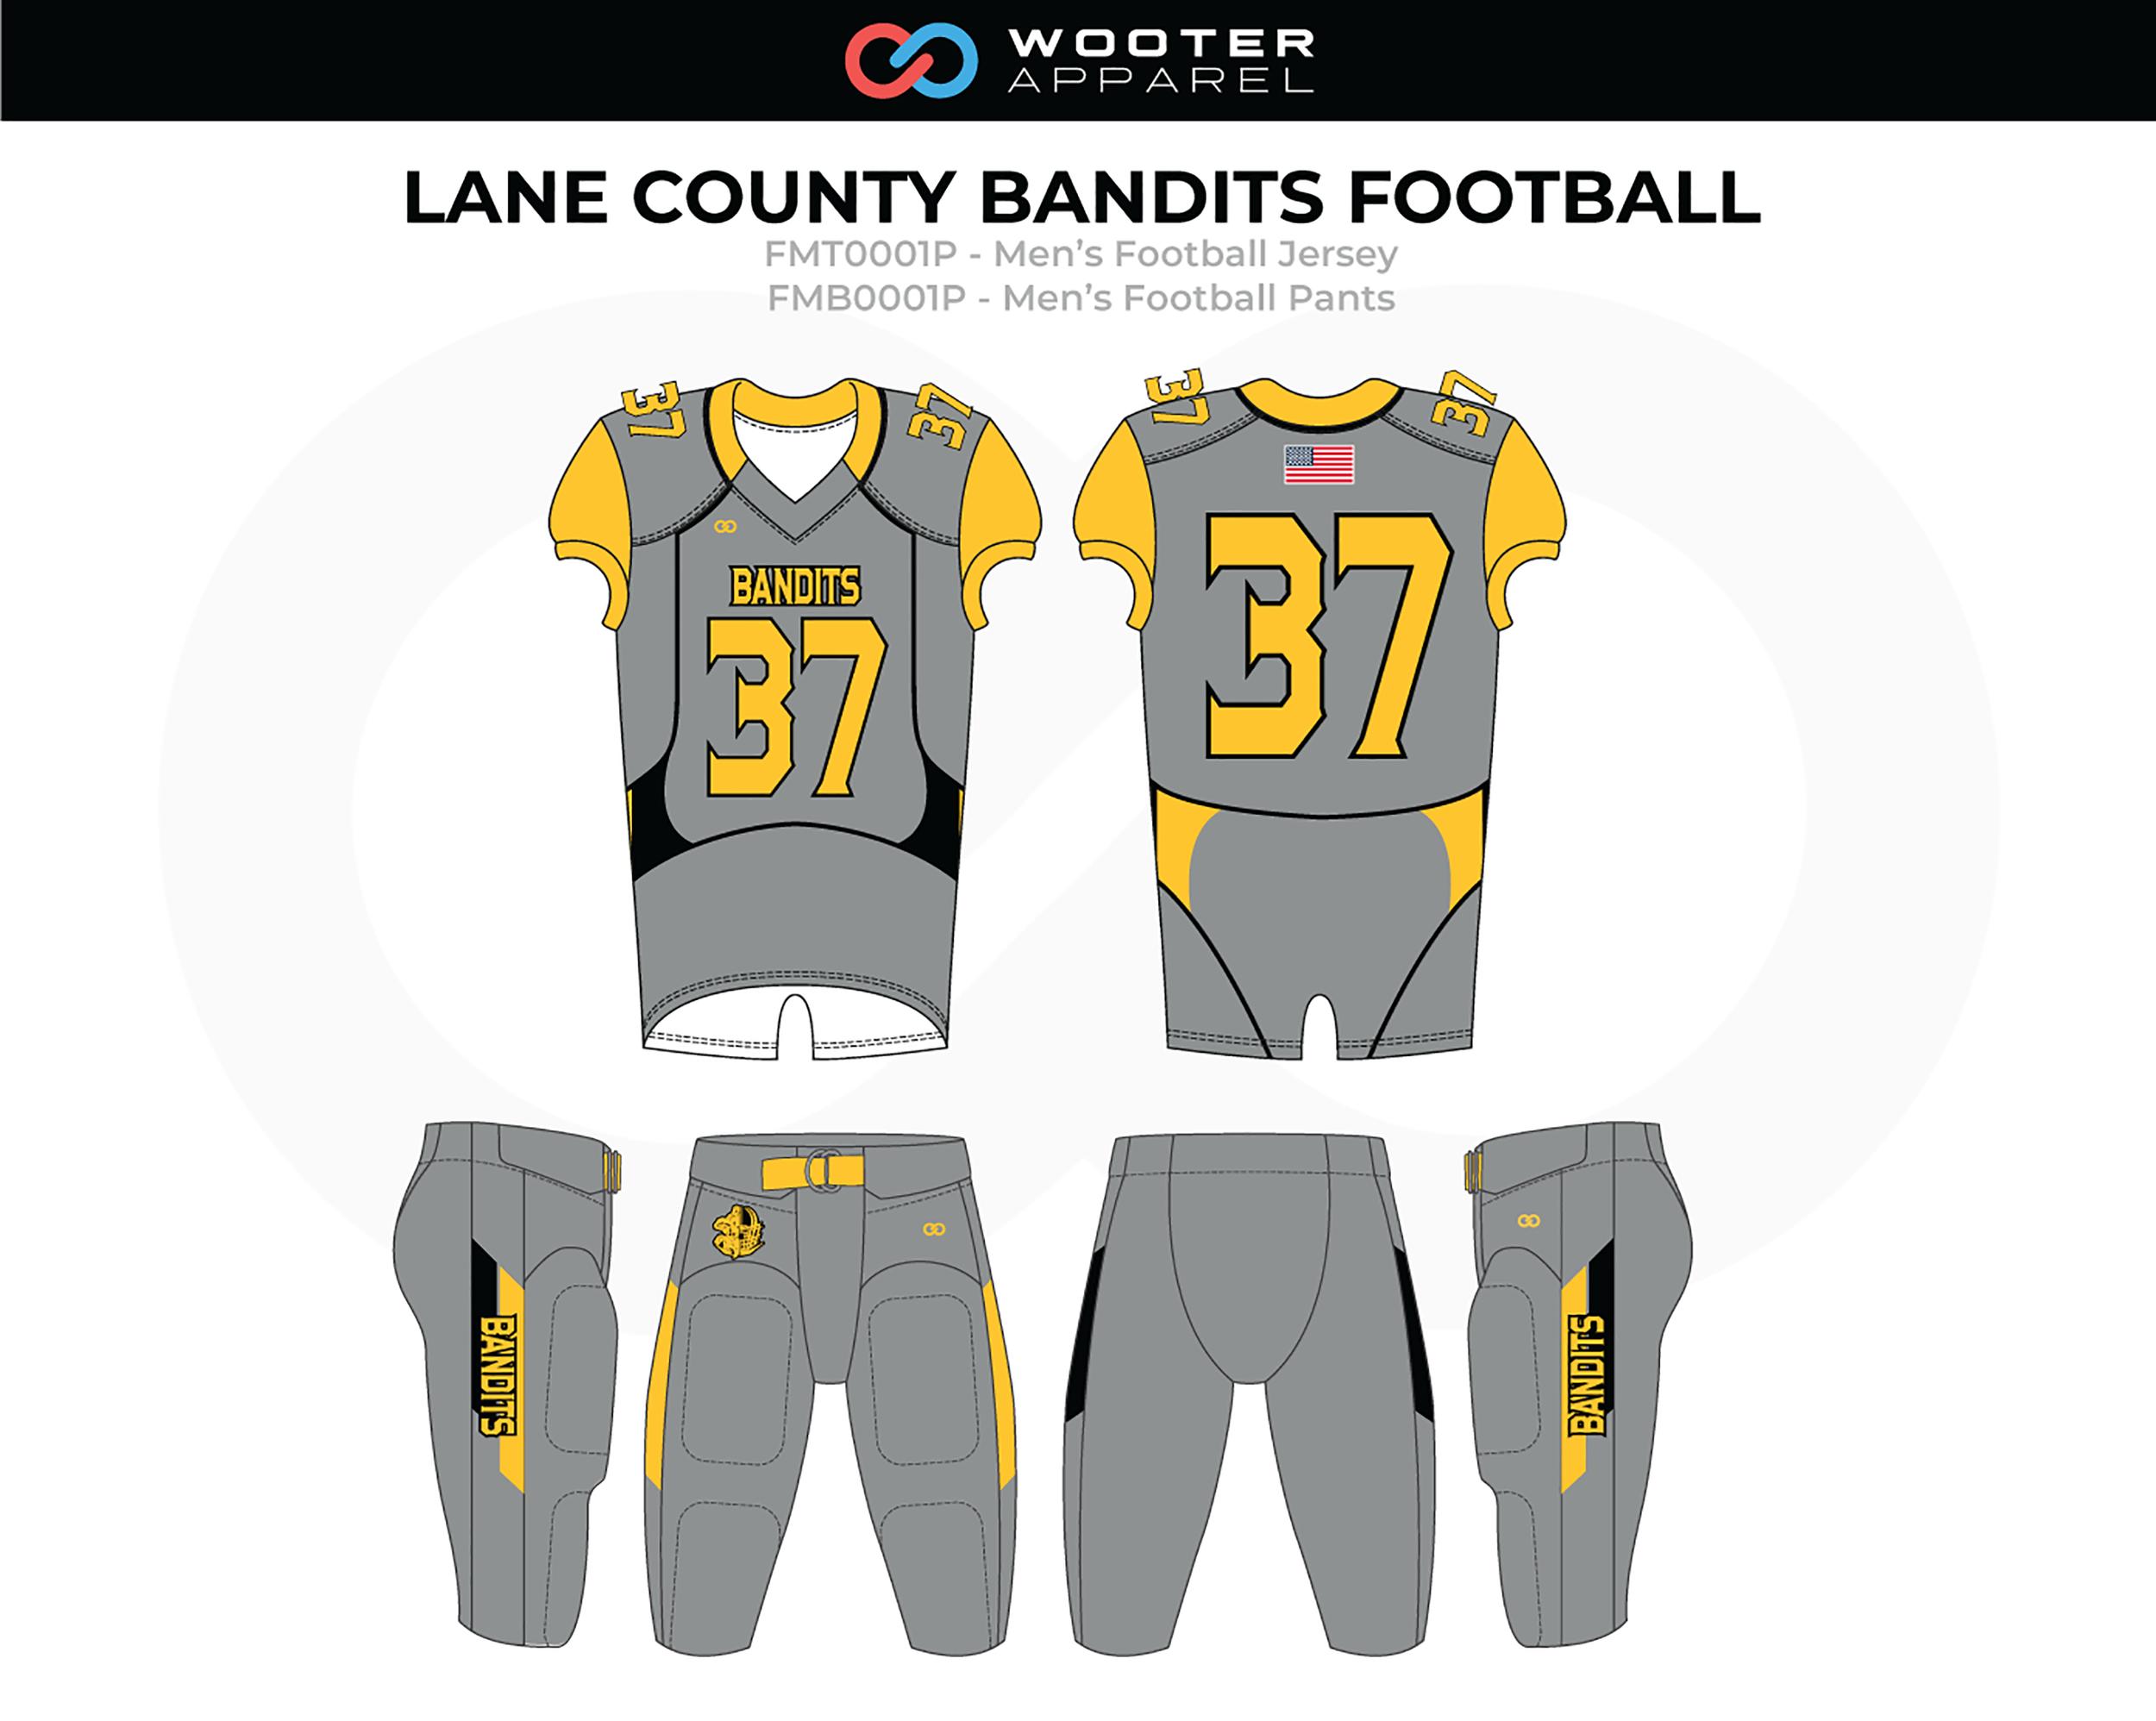 LANE COUNTY BANDITS Gray Yellow Men's Football Uniforms, Jerseys, and Pants